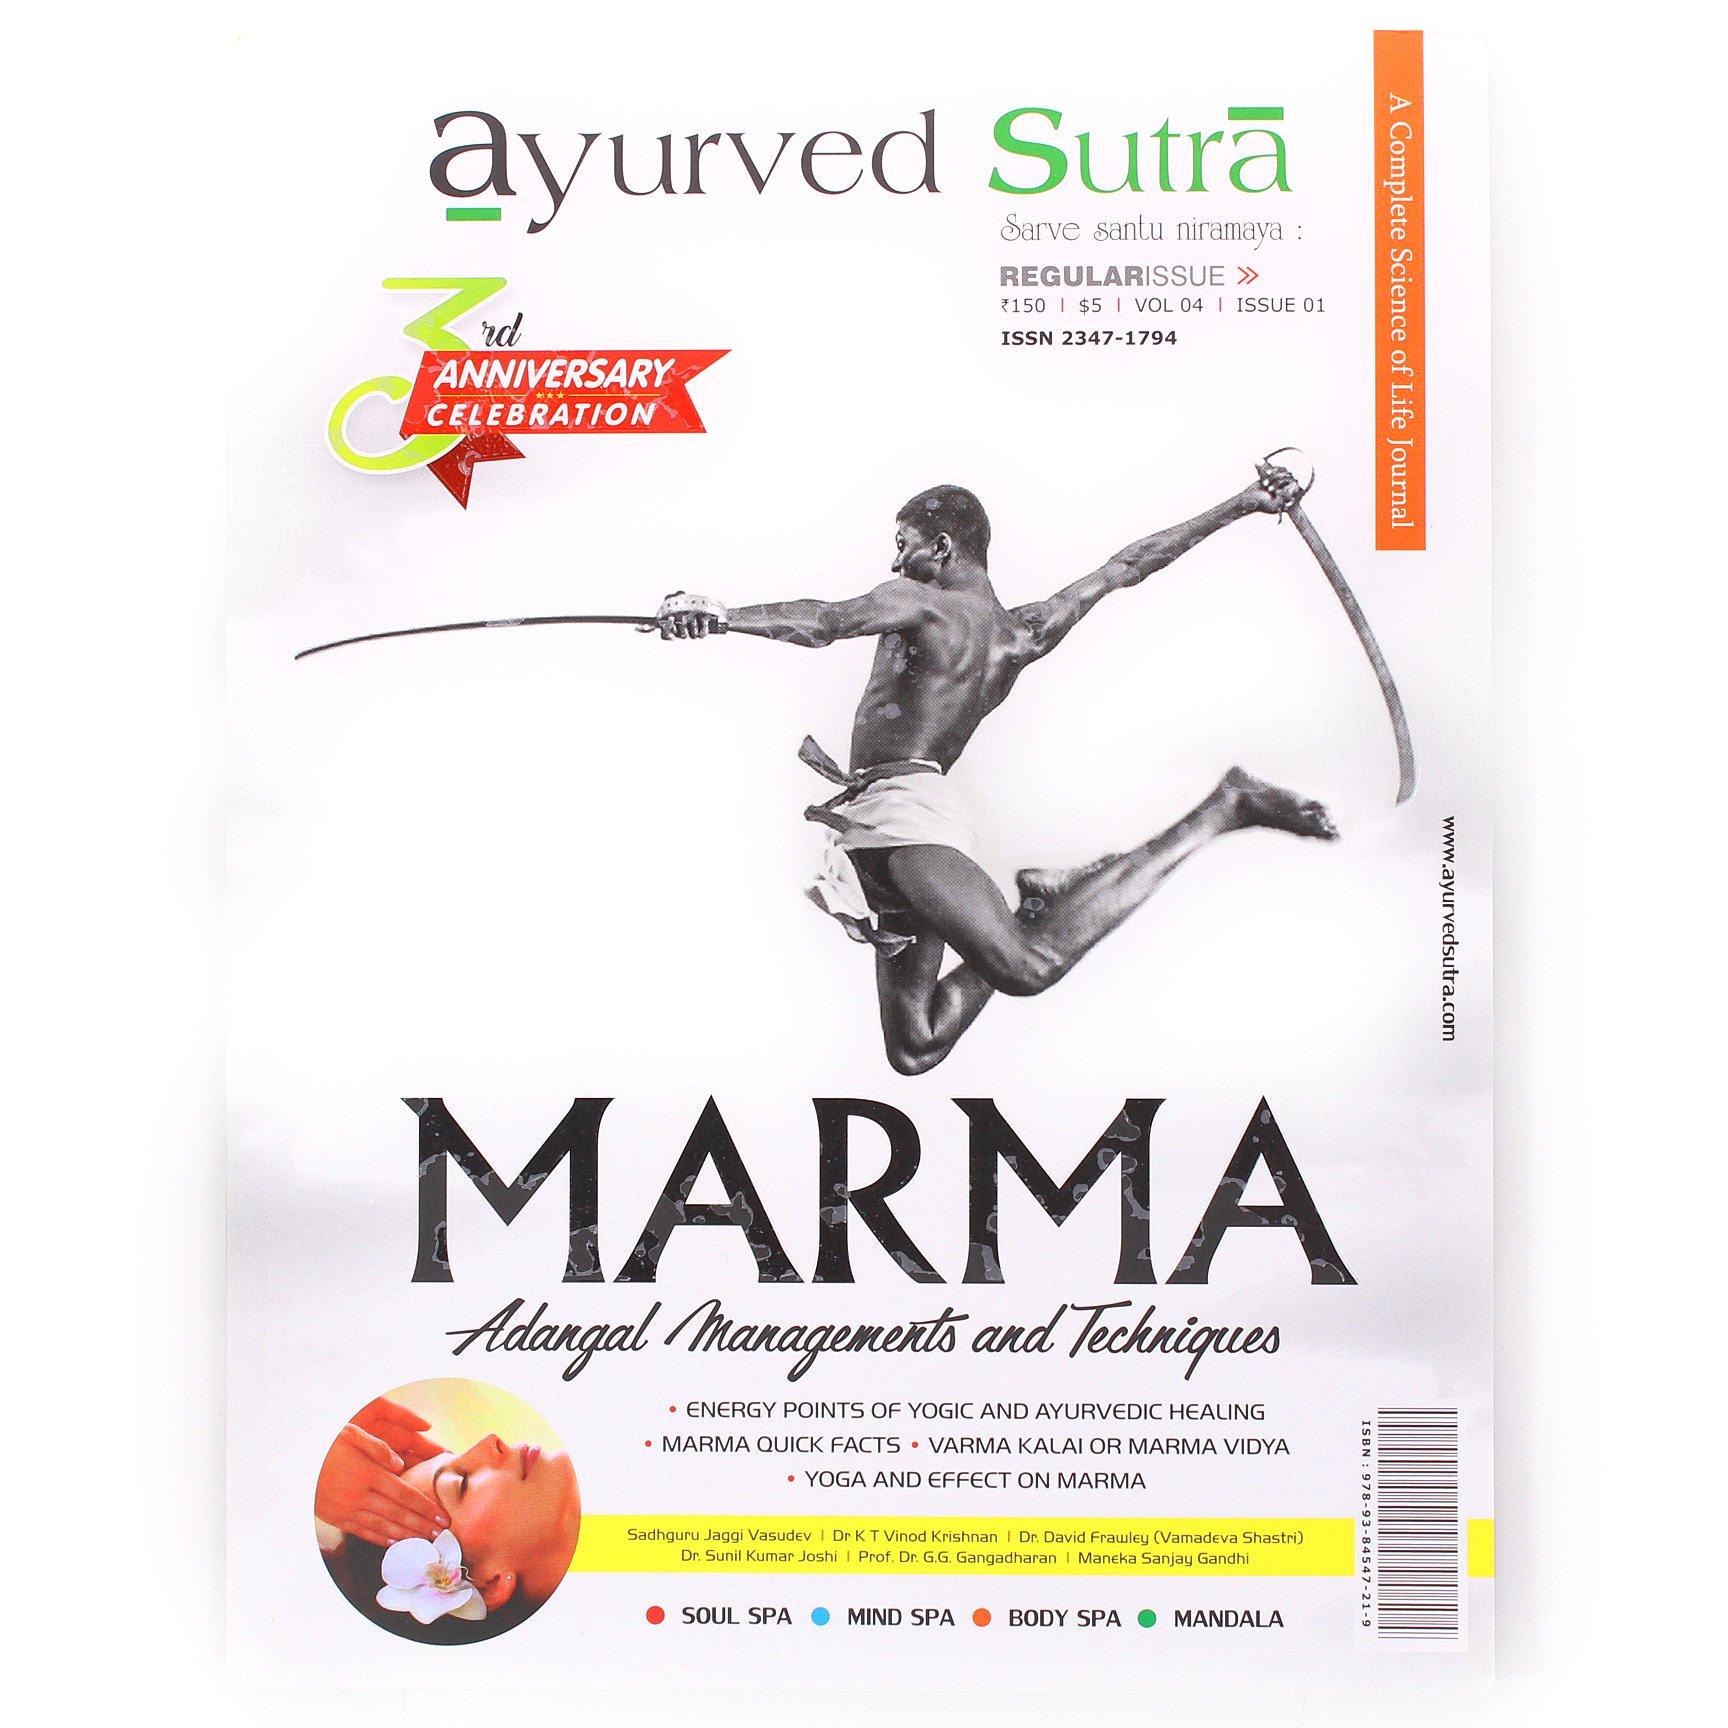 Ayurved Sutra / Marma (English)